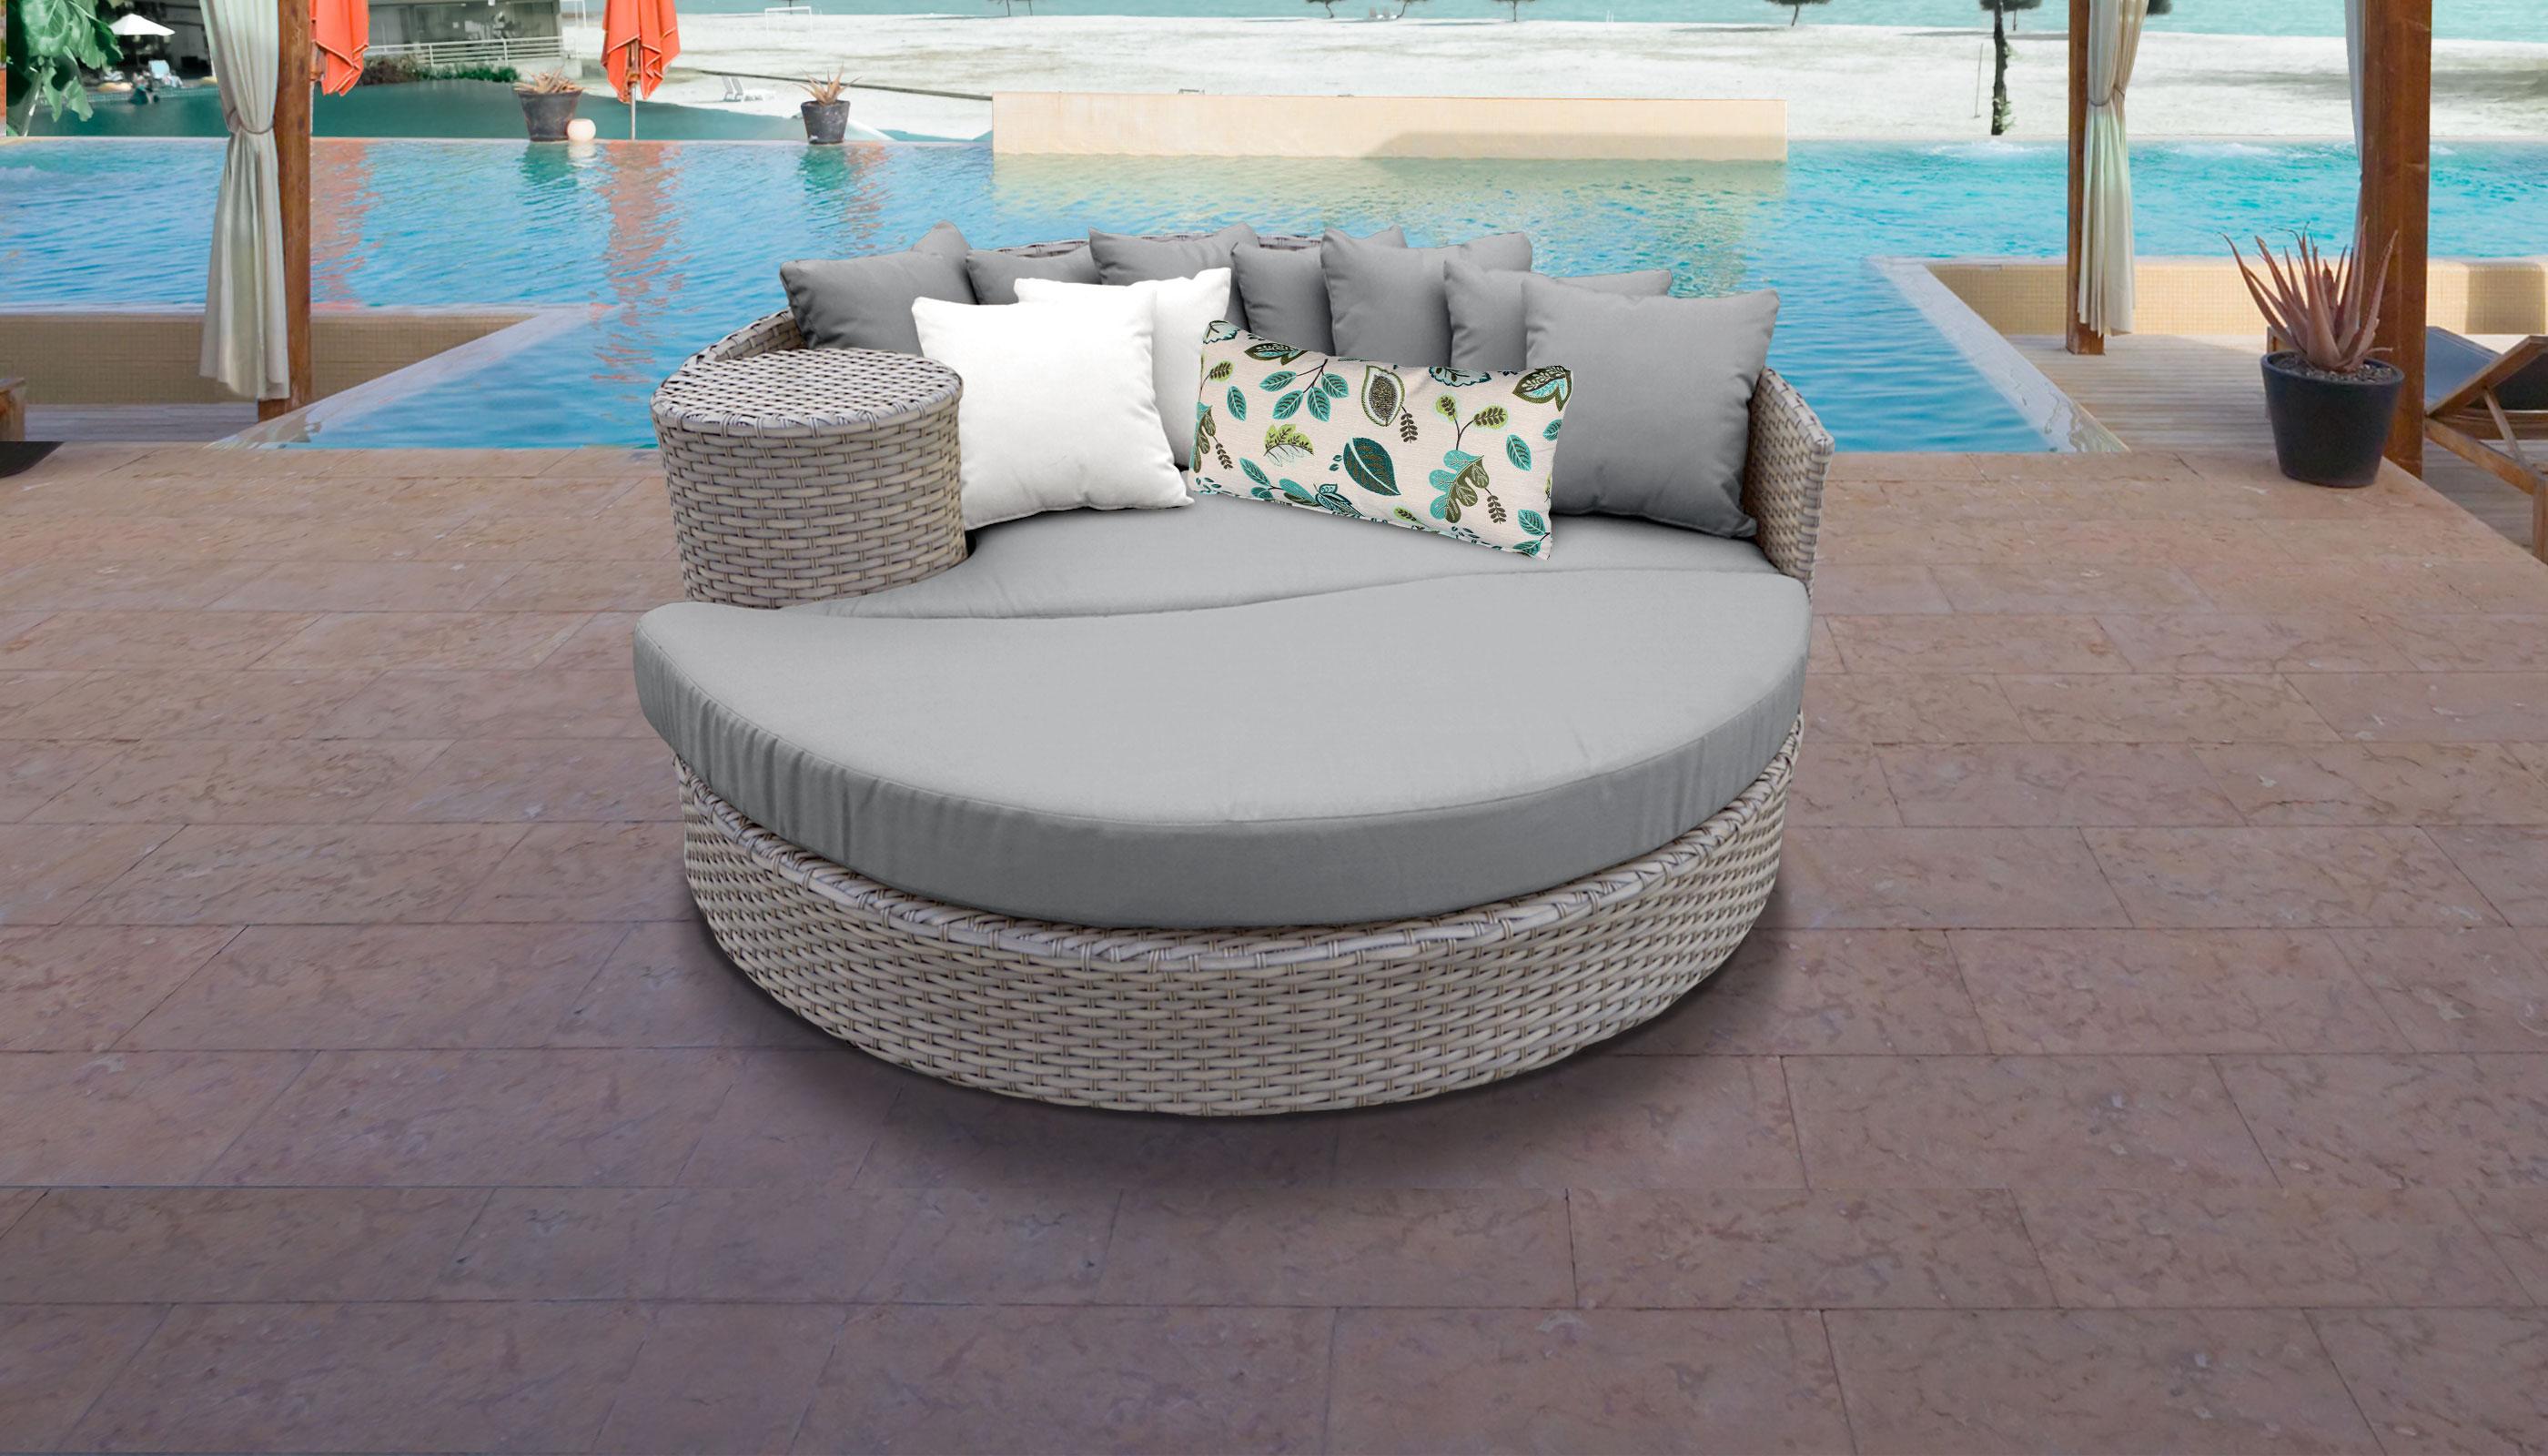 Awe Inspiring Florence Circular Sun Bed Outdoor Wicker Patio Furniture Download Free Architecture Designs Embacsunscenecom